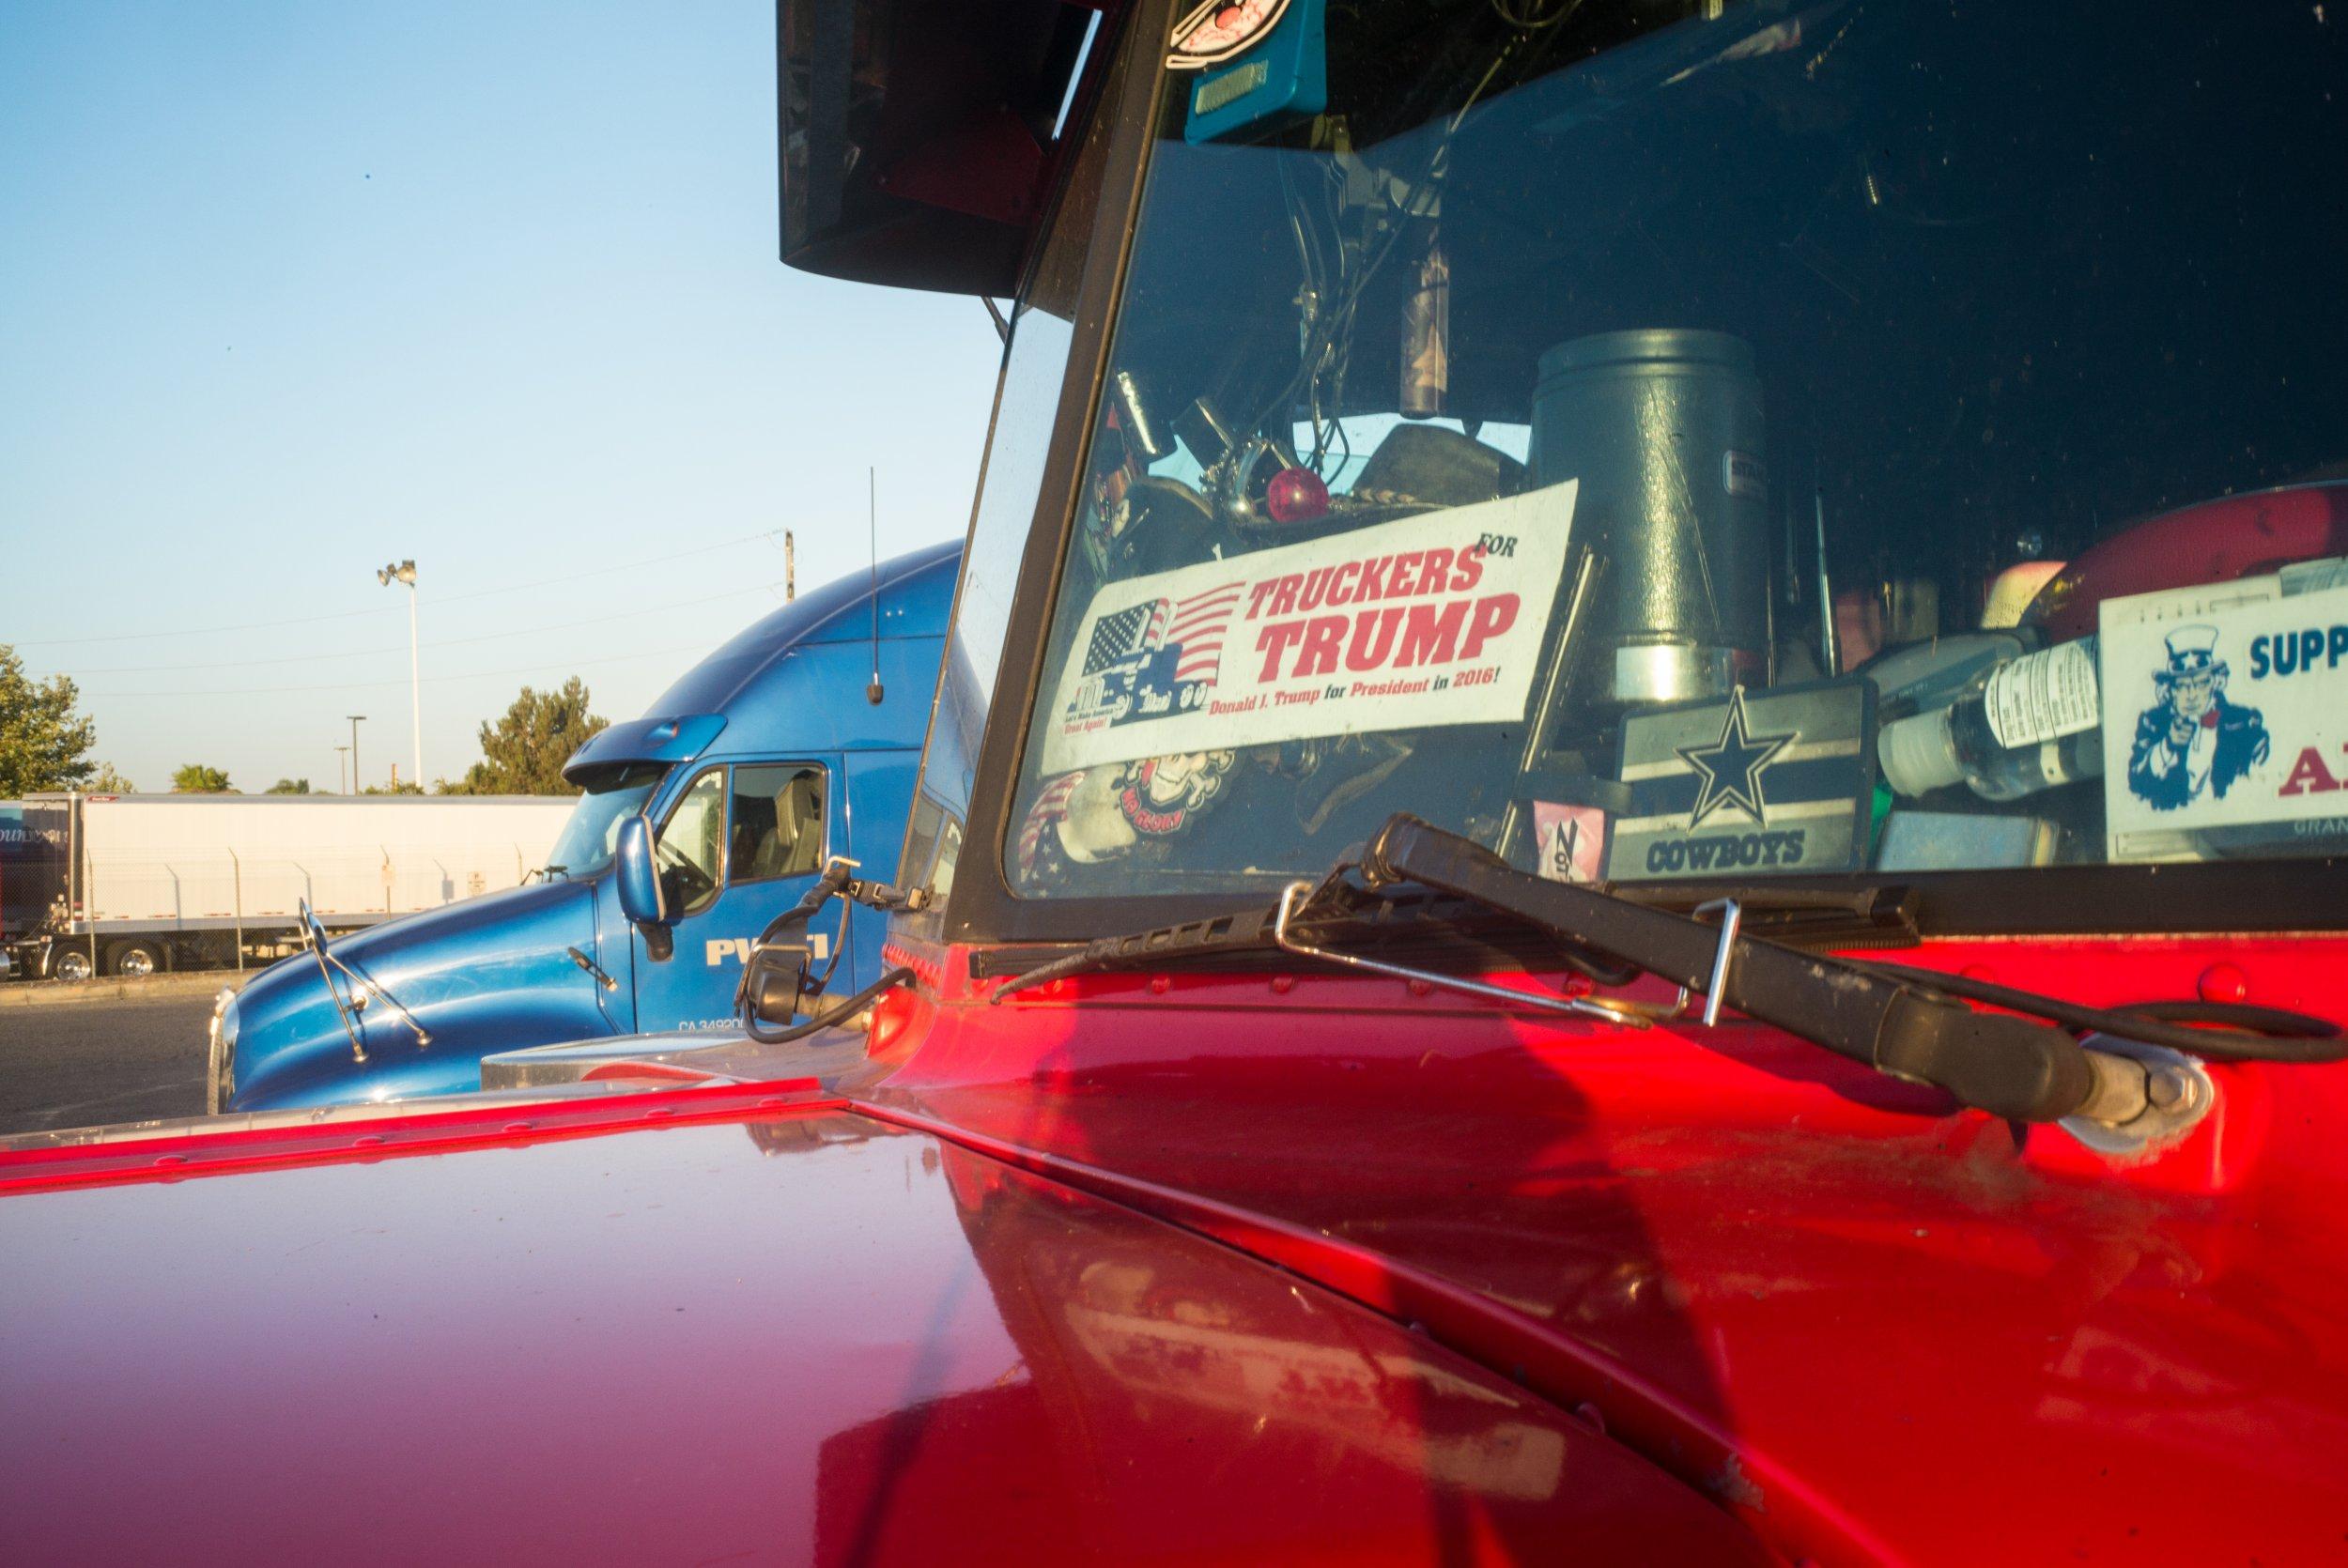 07_18_Trucker4Trump_01